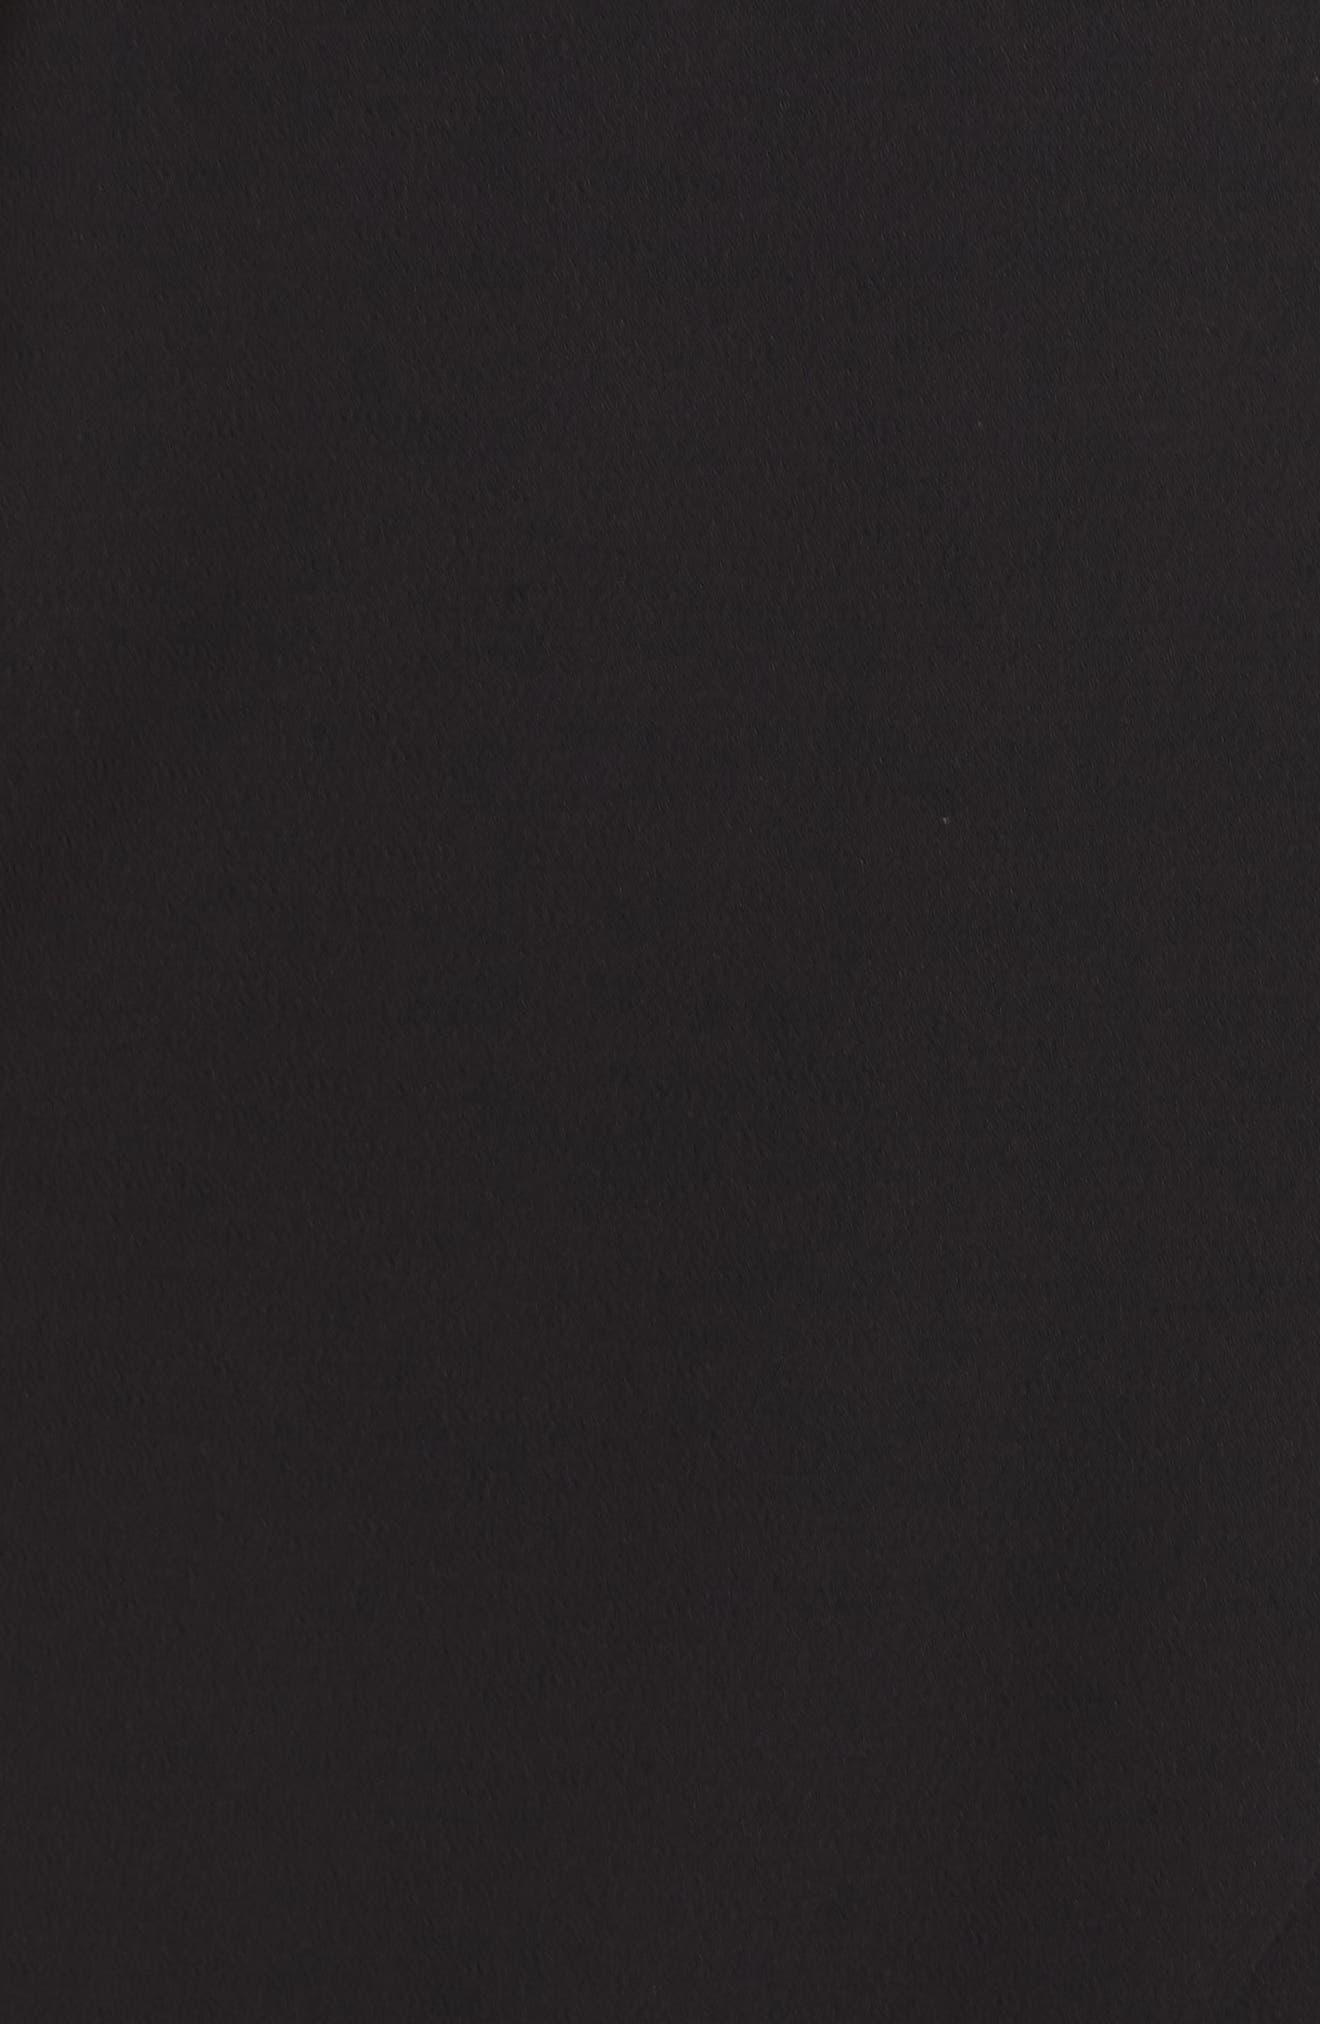 Off the Shoulder Ruffle Midi Dress,                             Alternate thumbnail 6, color,                             BLACK